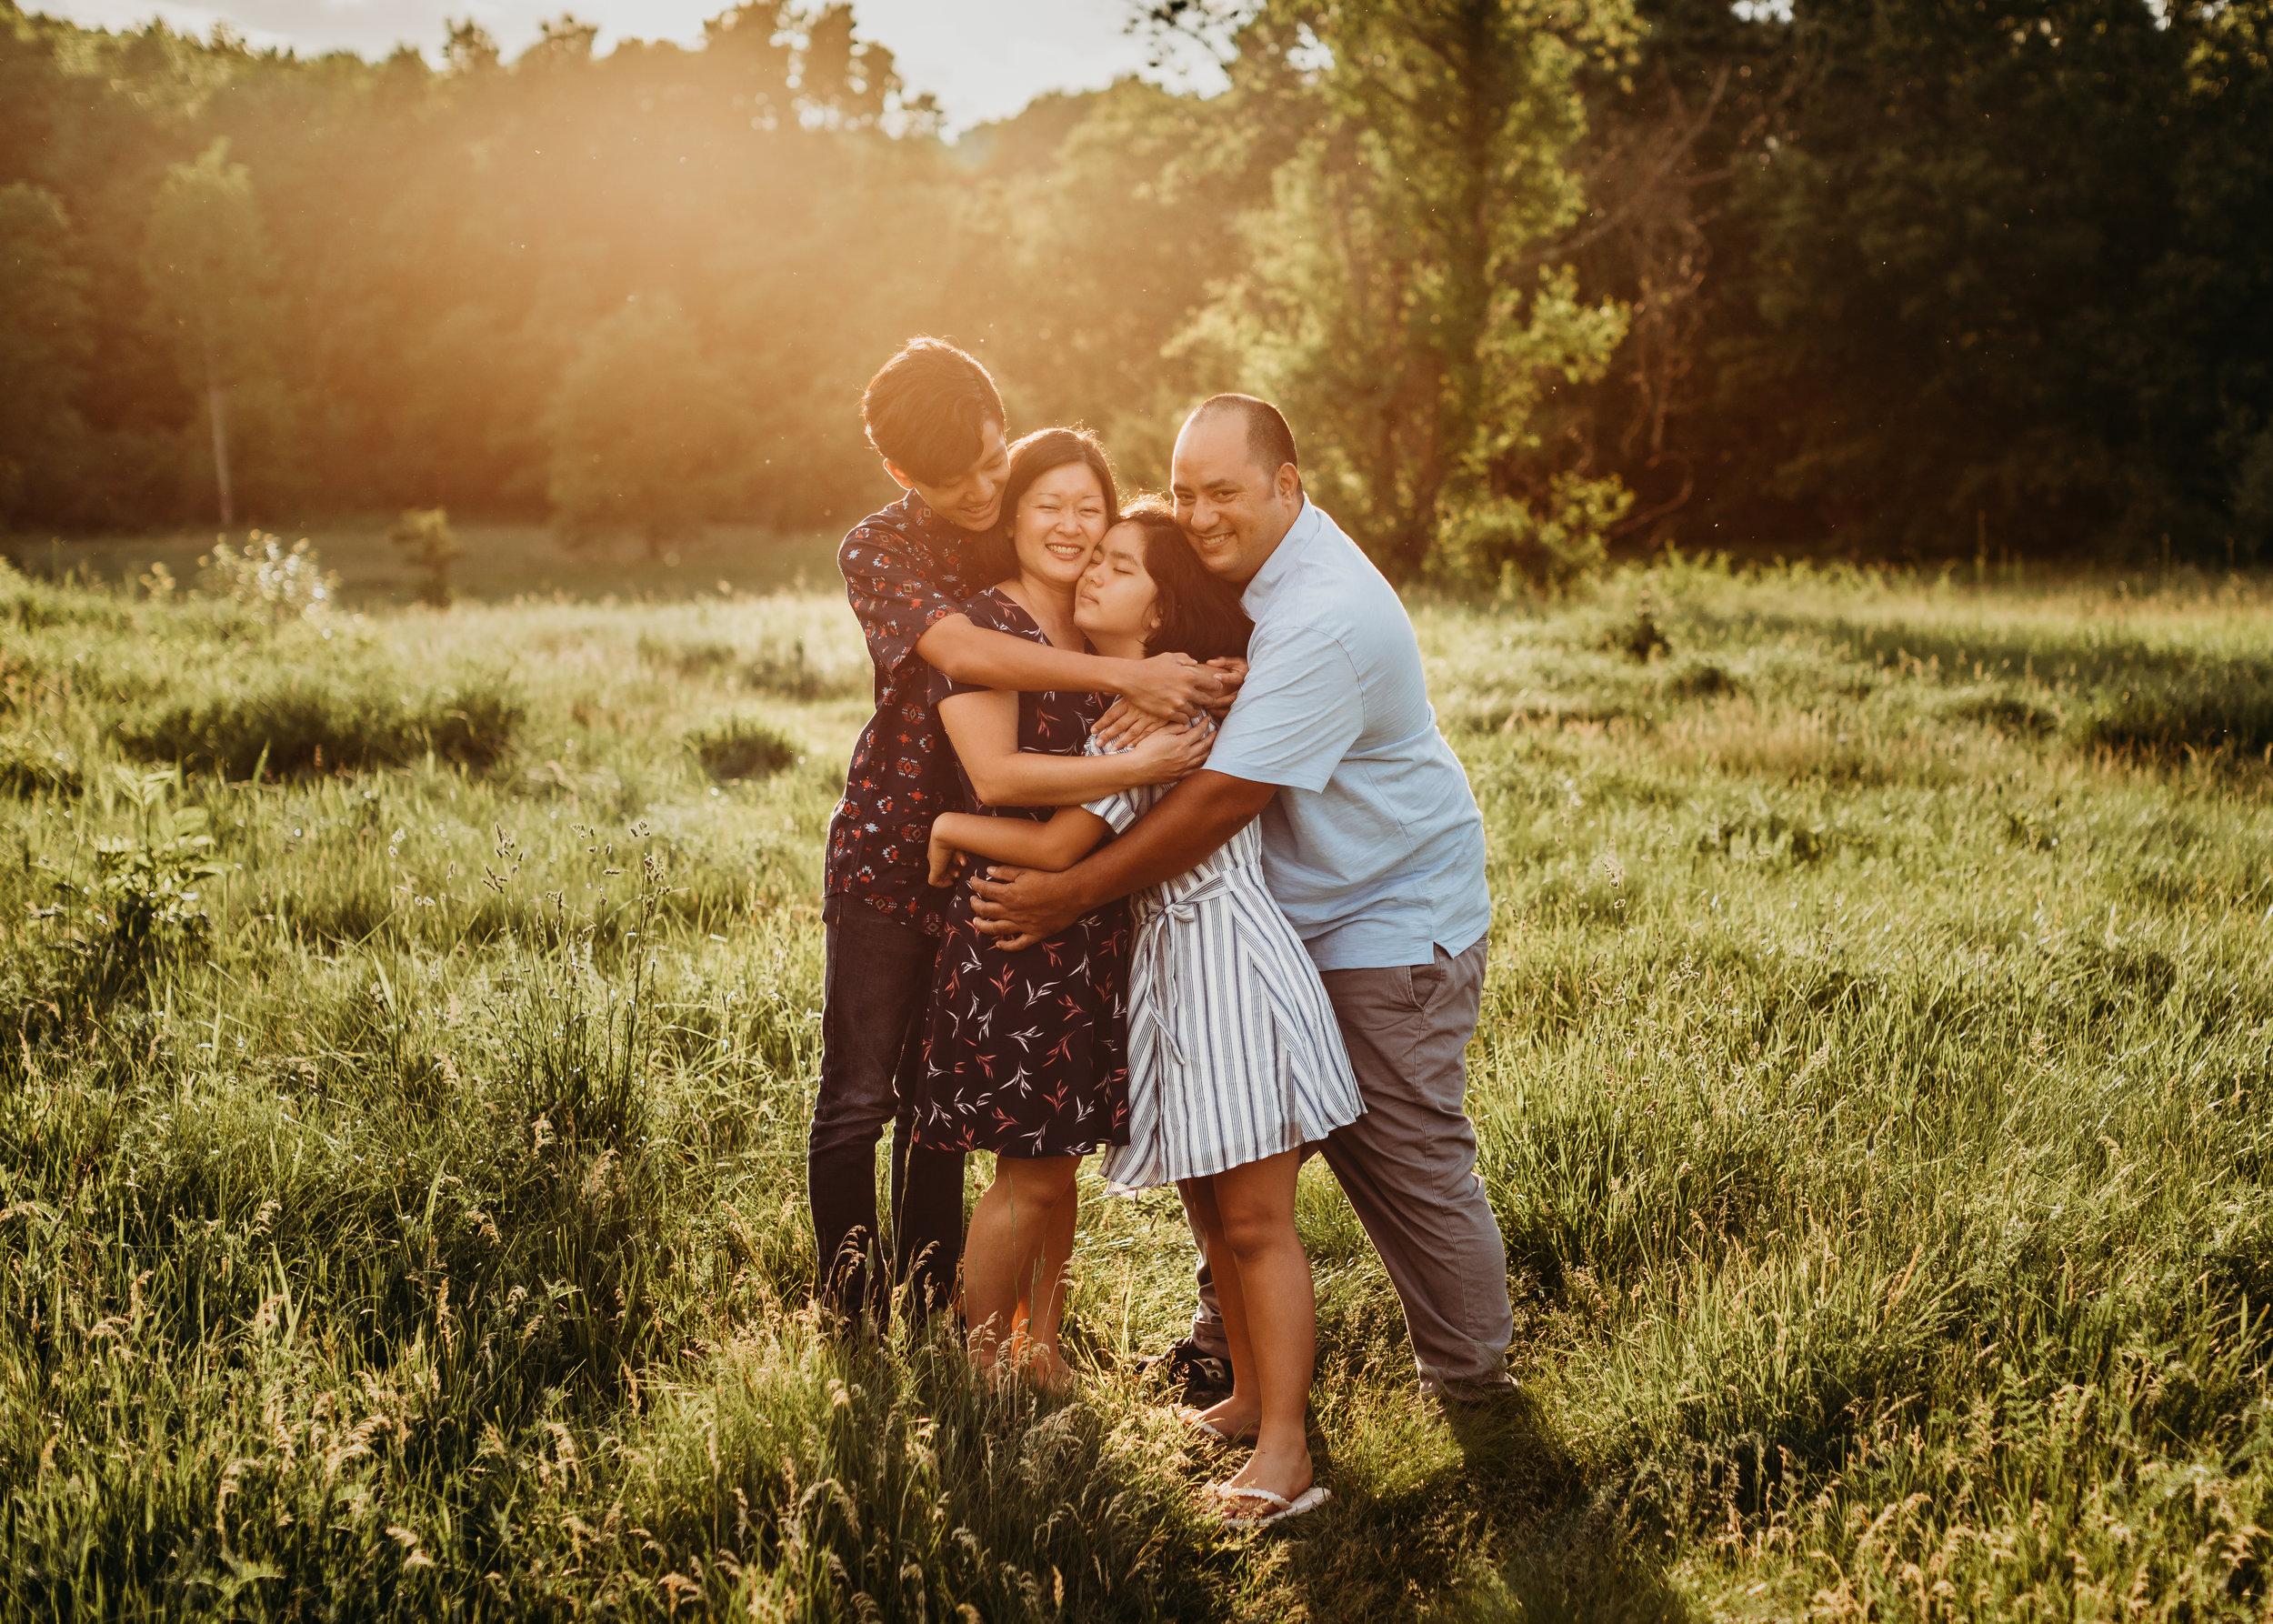 Oahu-Honolulu-Mini-Sessions-Family-Photography.jpg